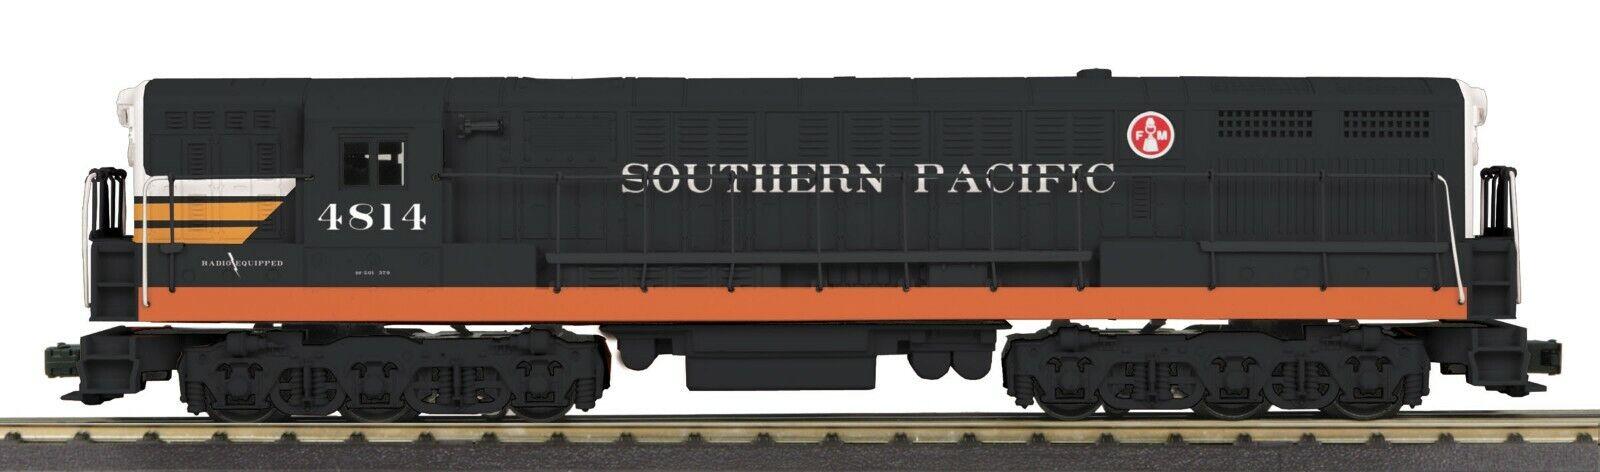 MTH  30-20387-1, 30-20387-1, 30-20387-1, 30-20387-3 SOUTHERN PACIFIC FM POWERED & NON POWERED PredO 3.0 6e2a39